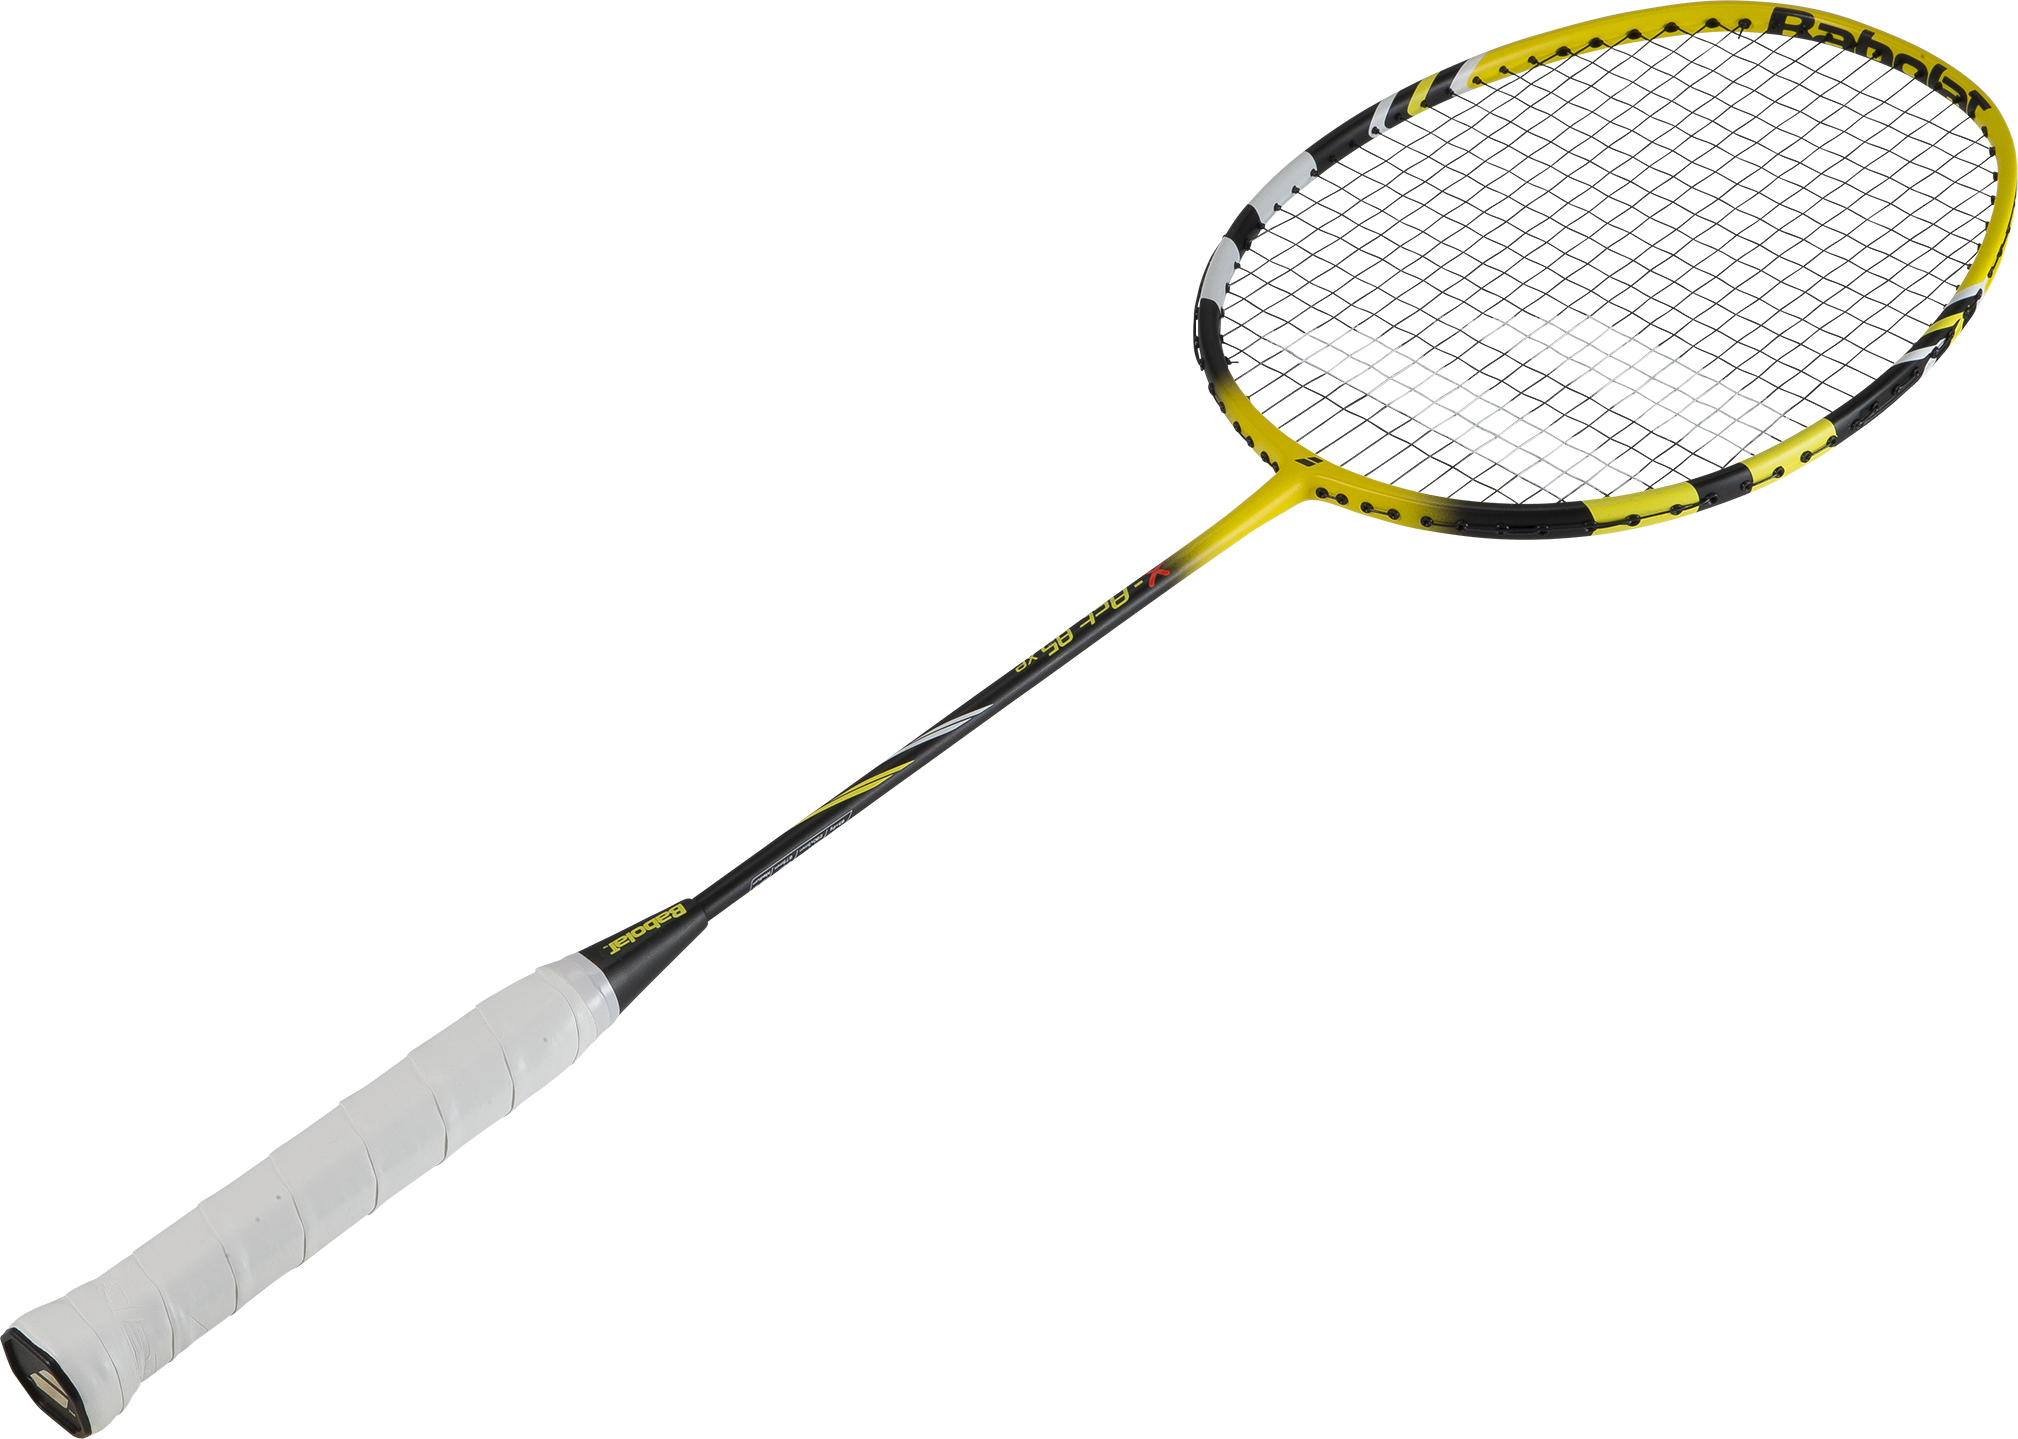 Png web icons now. Badminton clipart badminton equipment